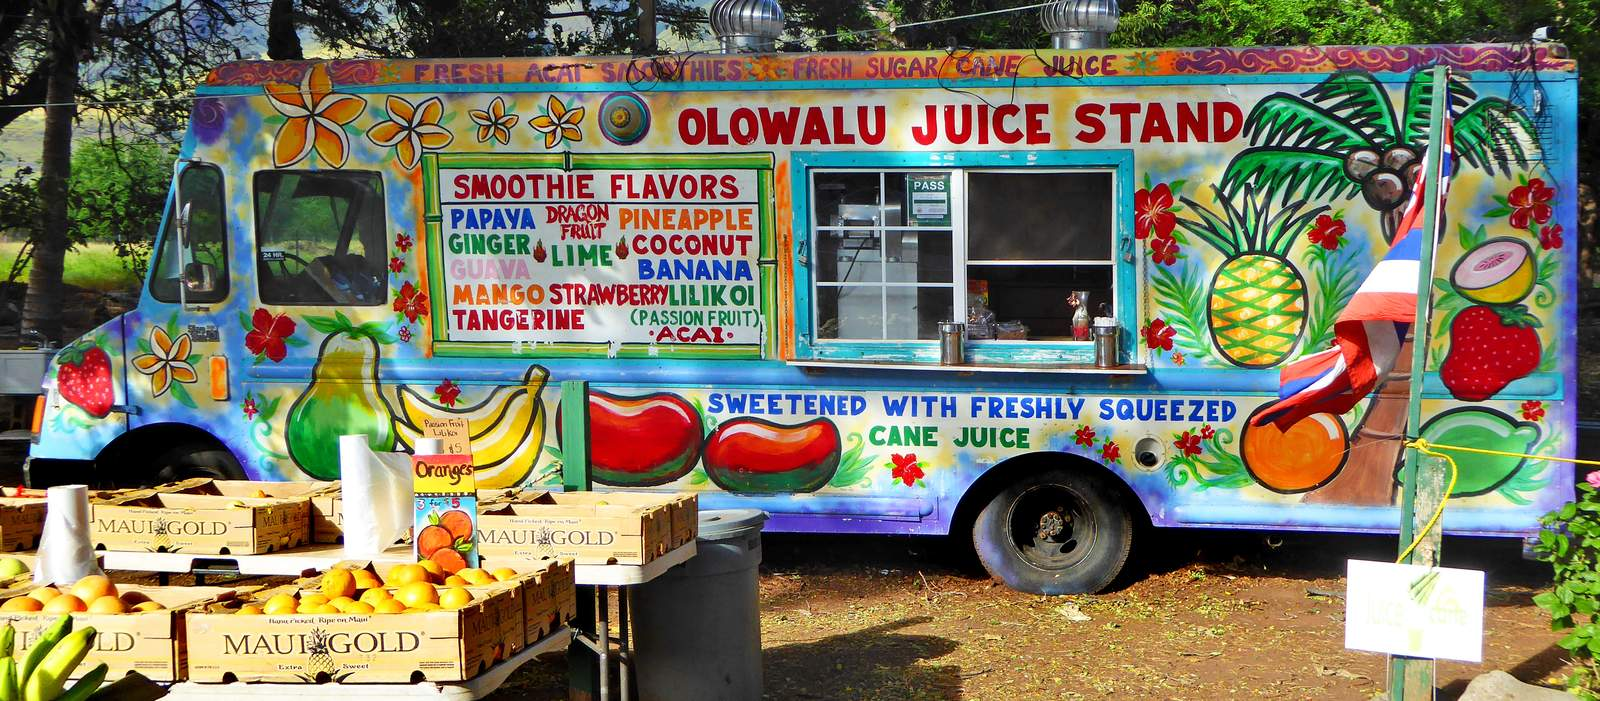 Olawalu Fruit Stand